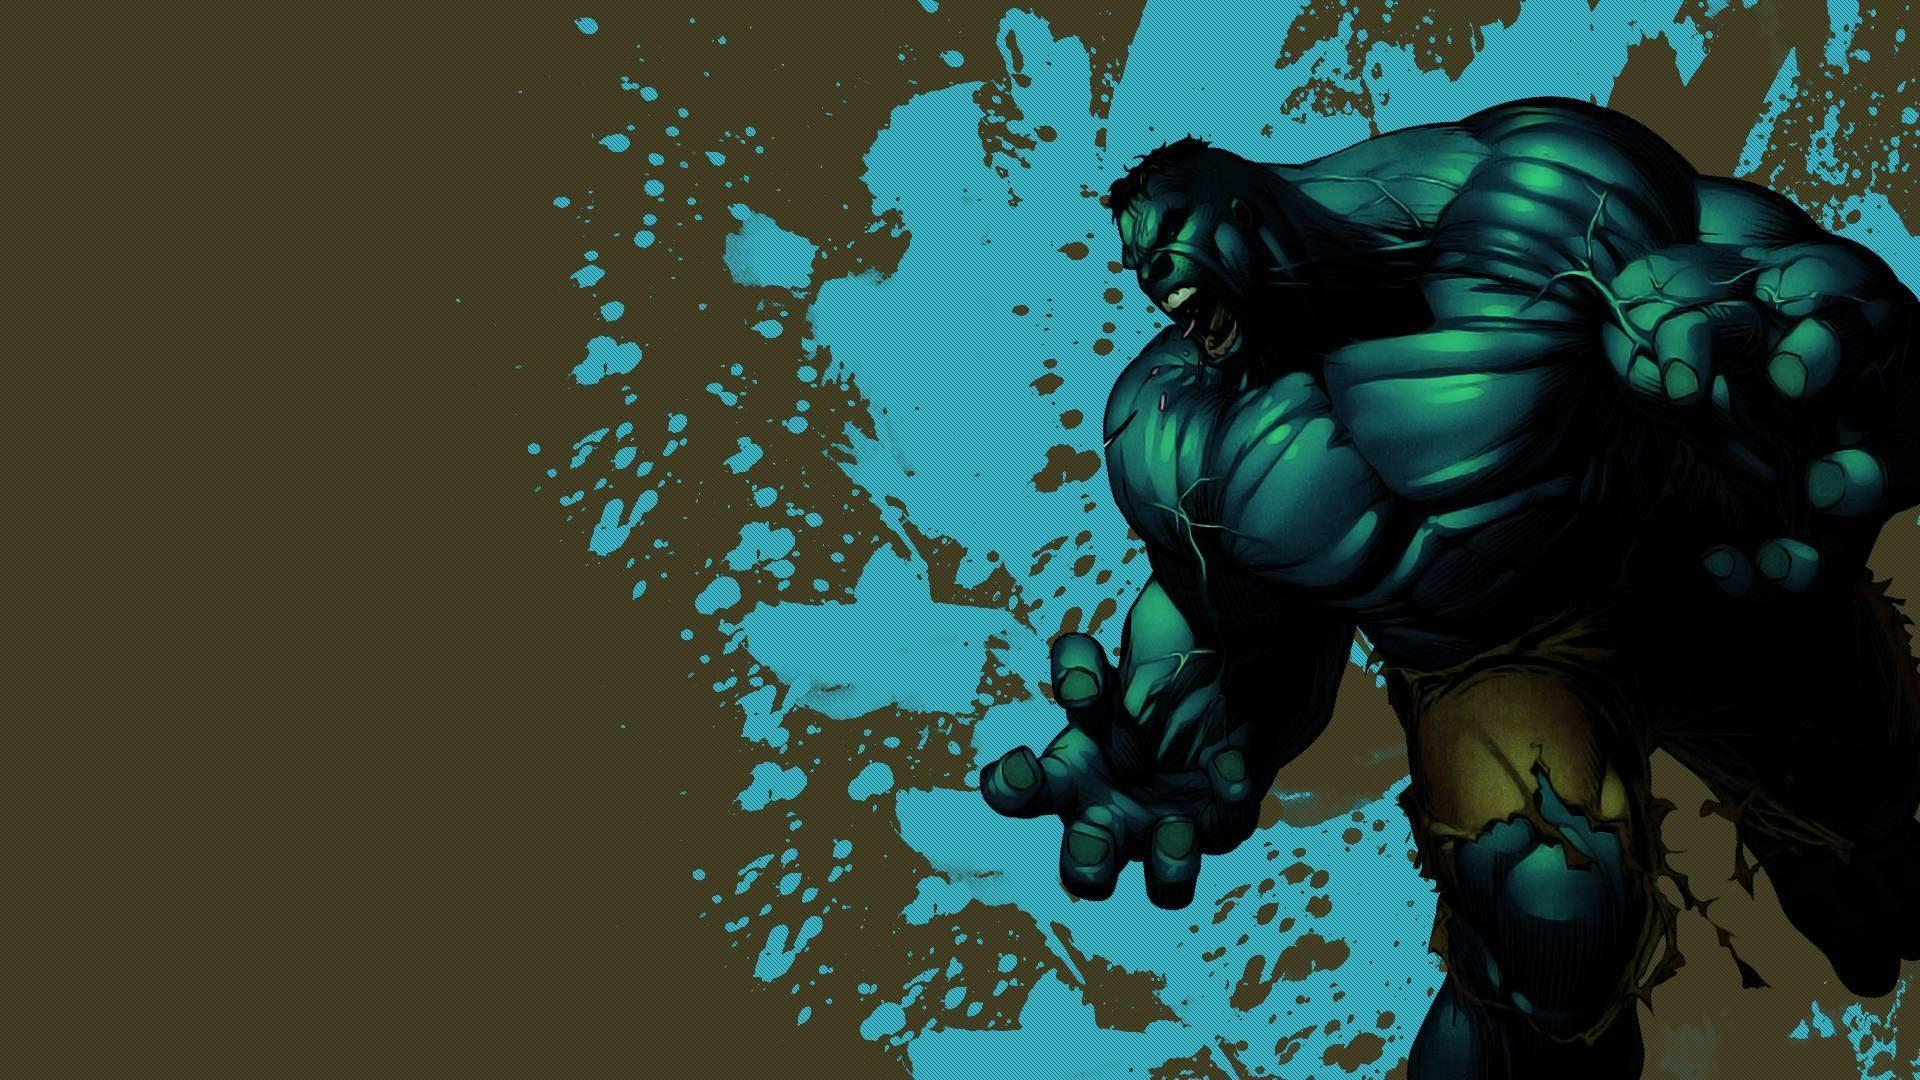 Hulk Wallpapers